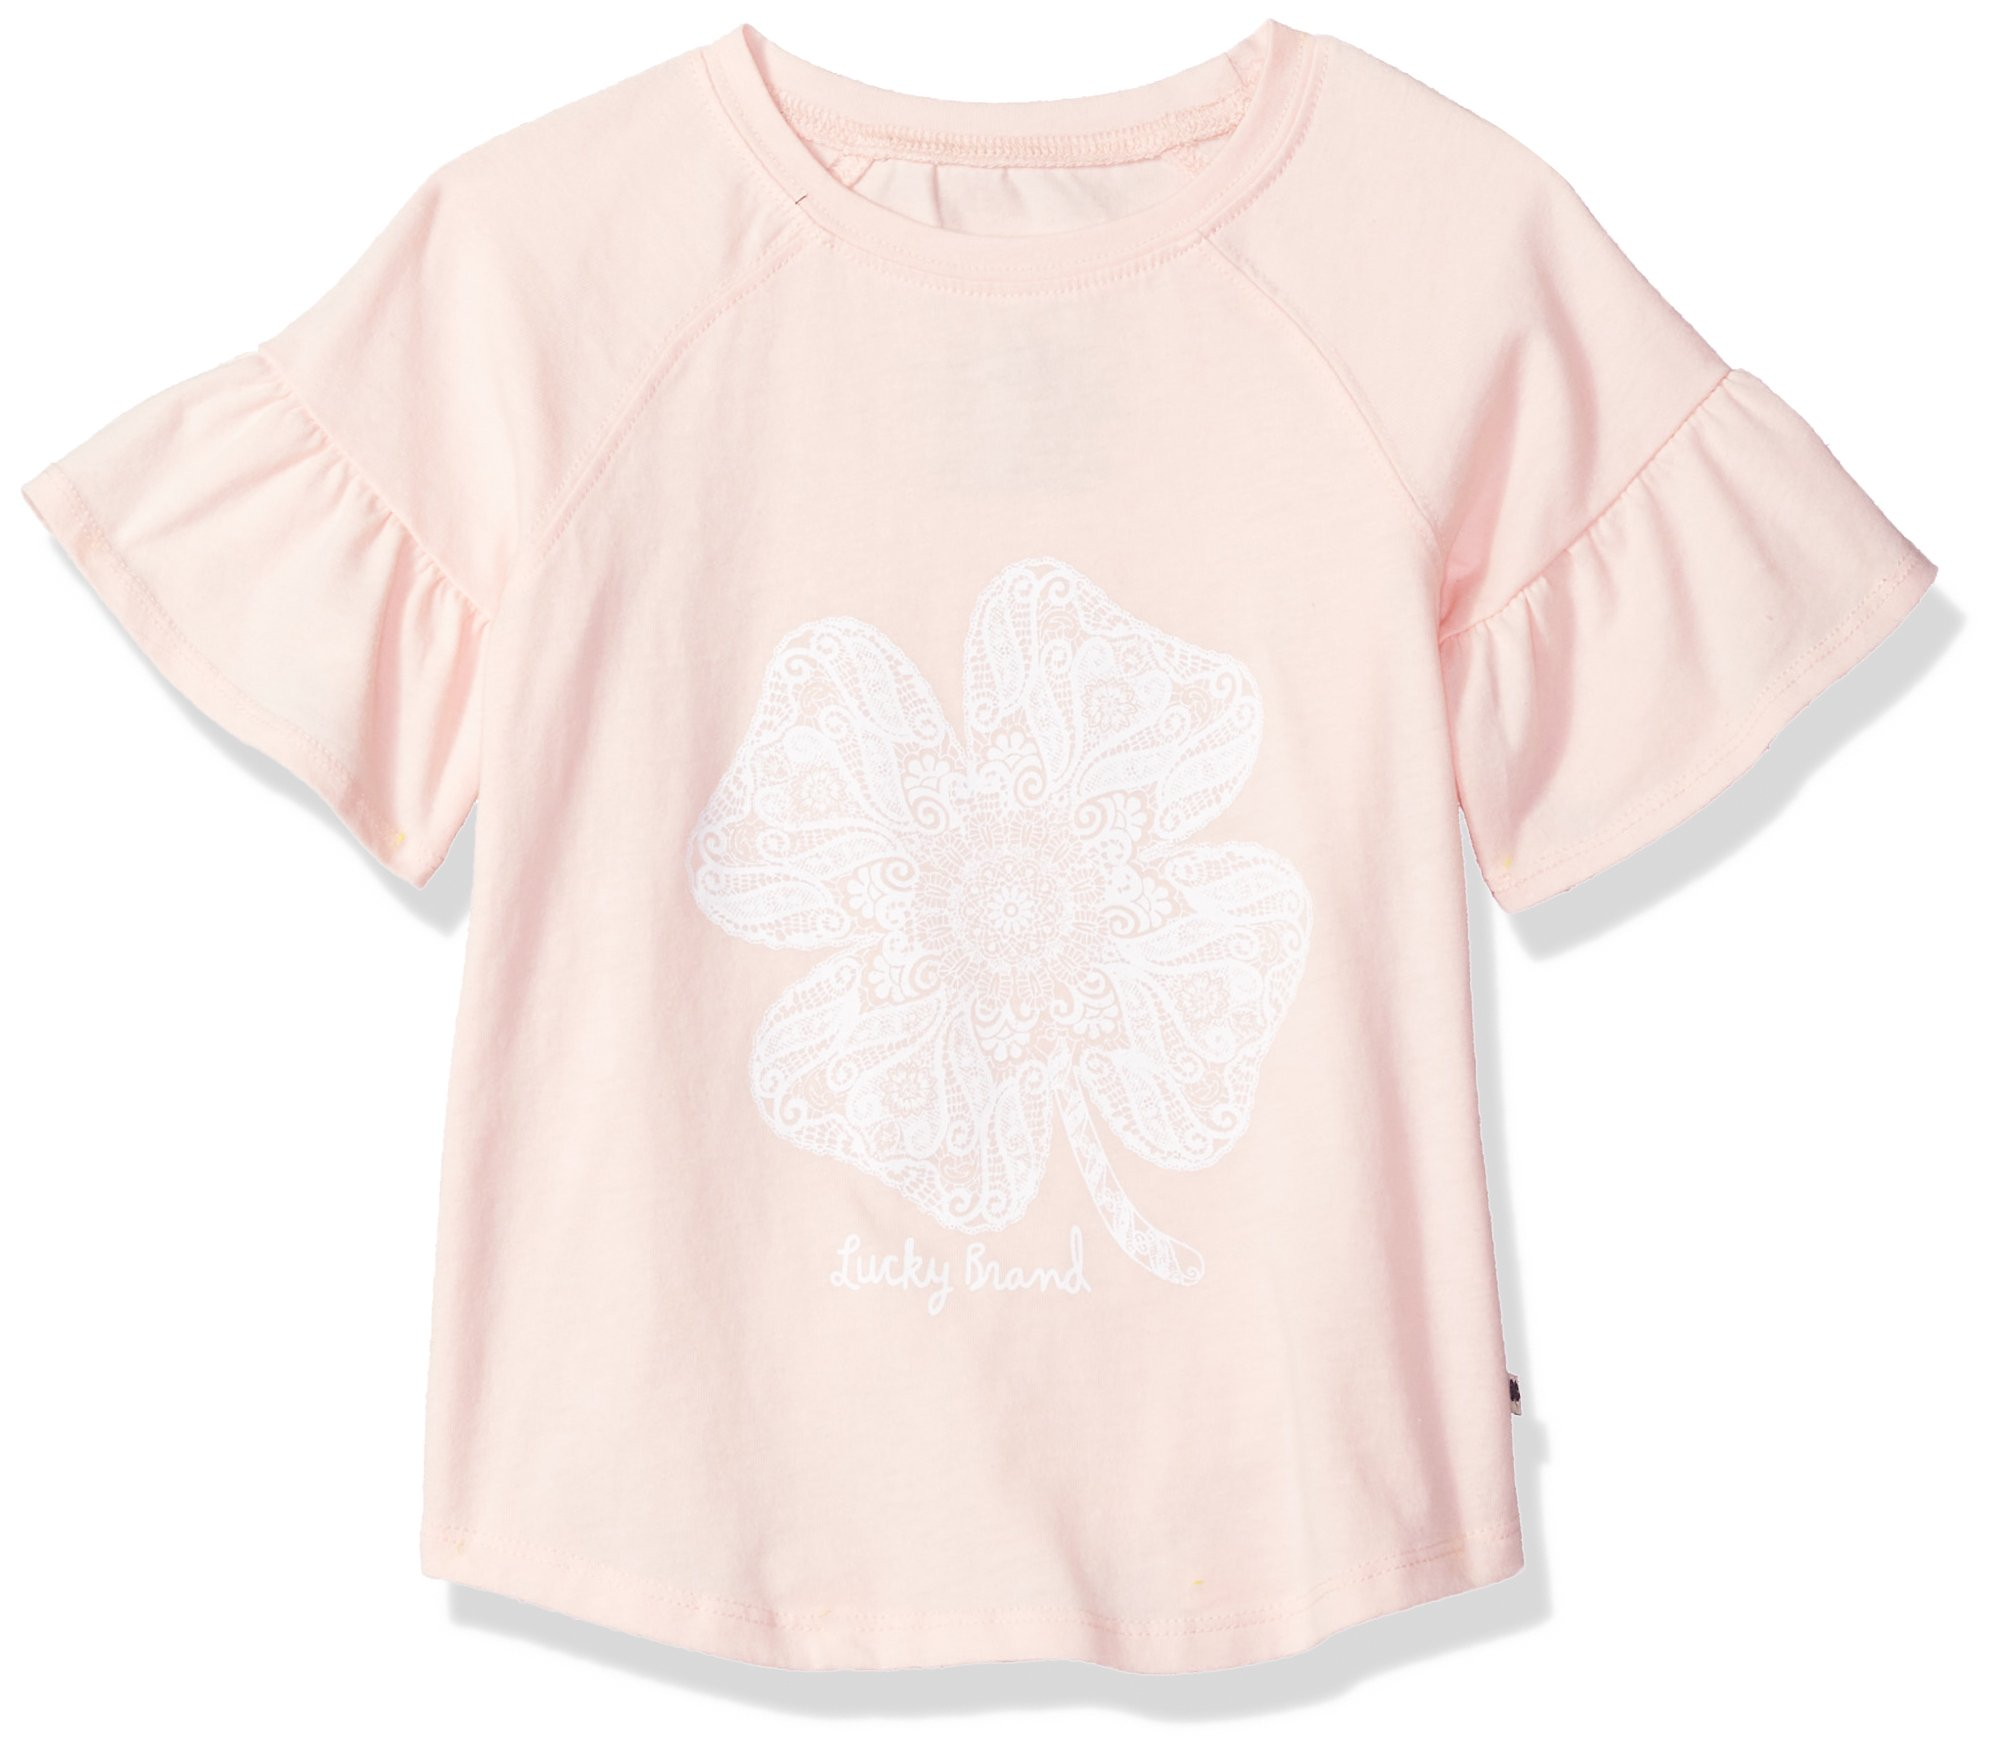 Lucky Brand Big Girls' Belinda Graphic Tee, Belinda Gossamer Pink, X-Large (16)